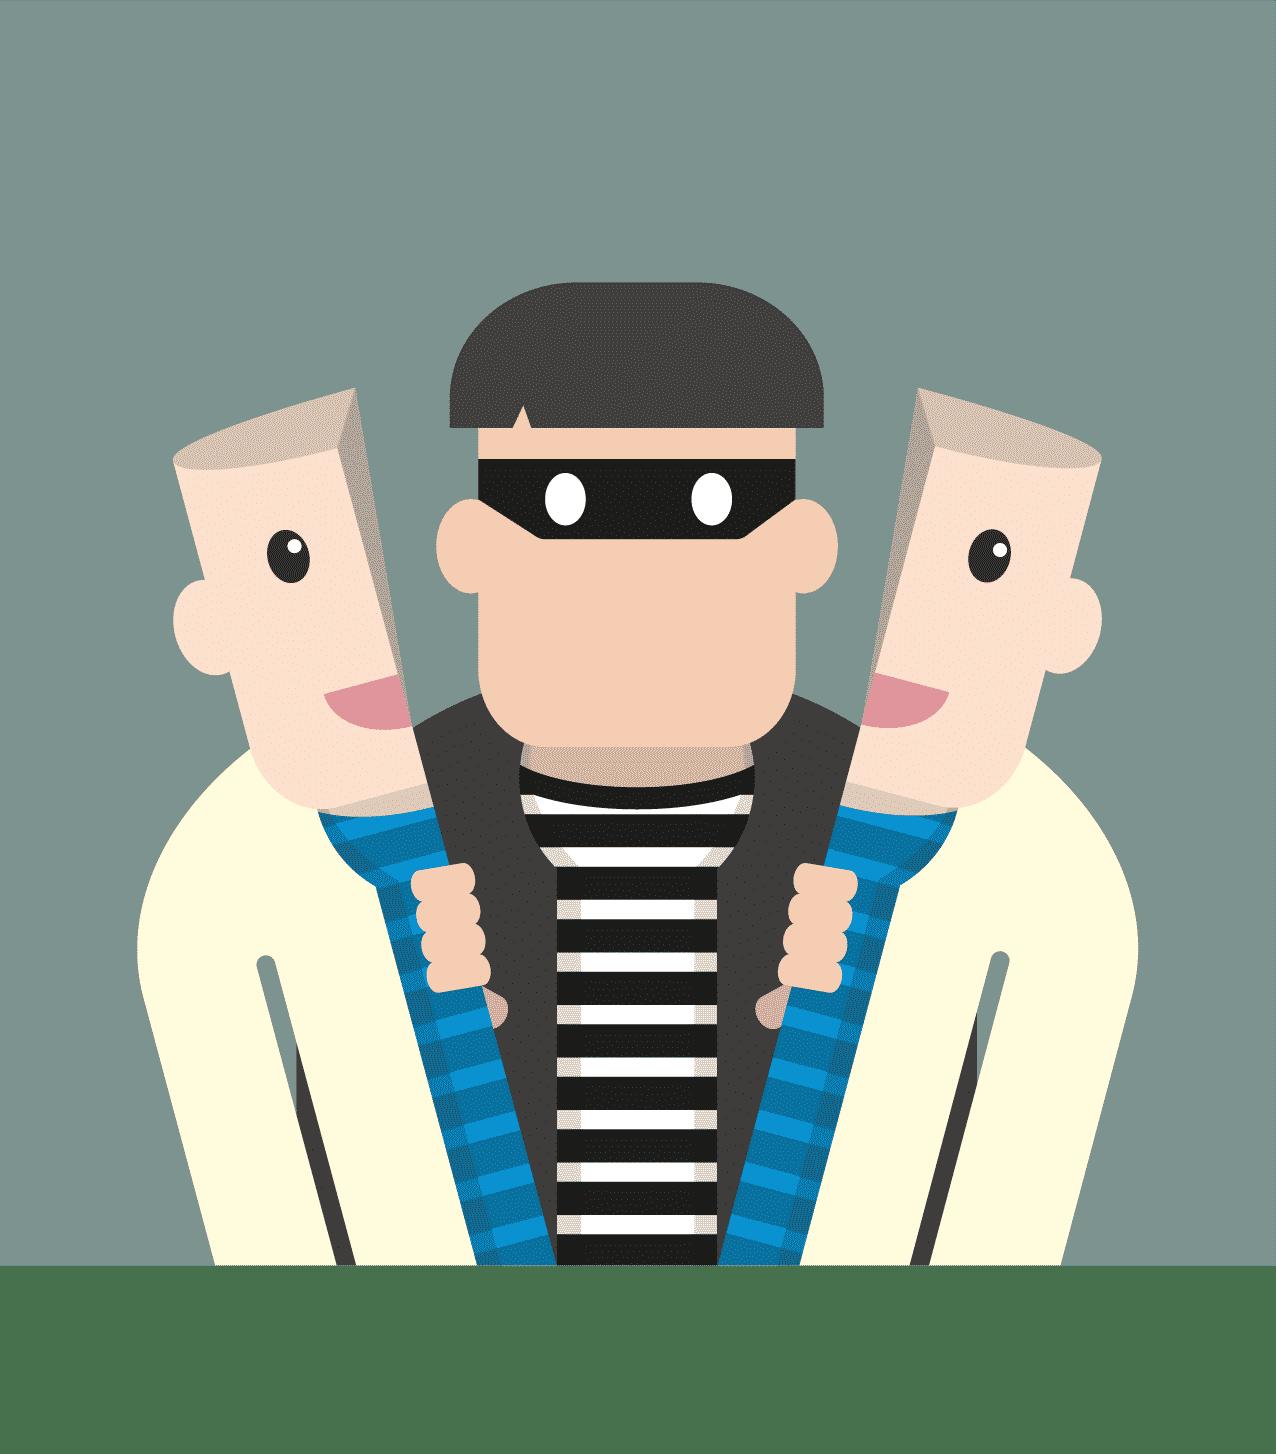 insider-threats_employees